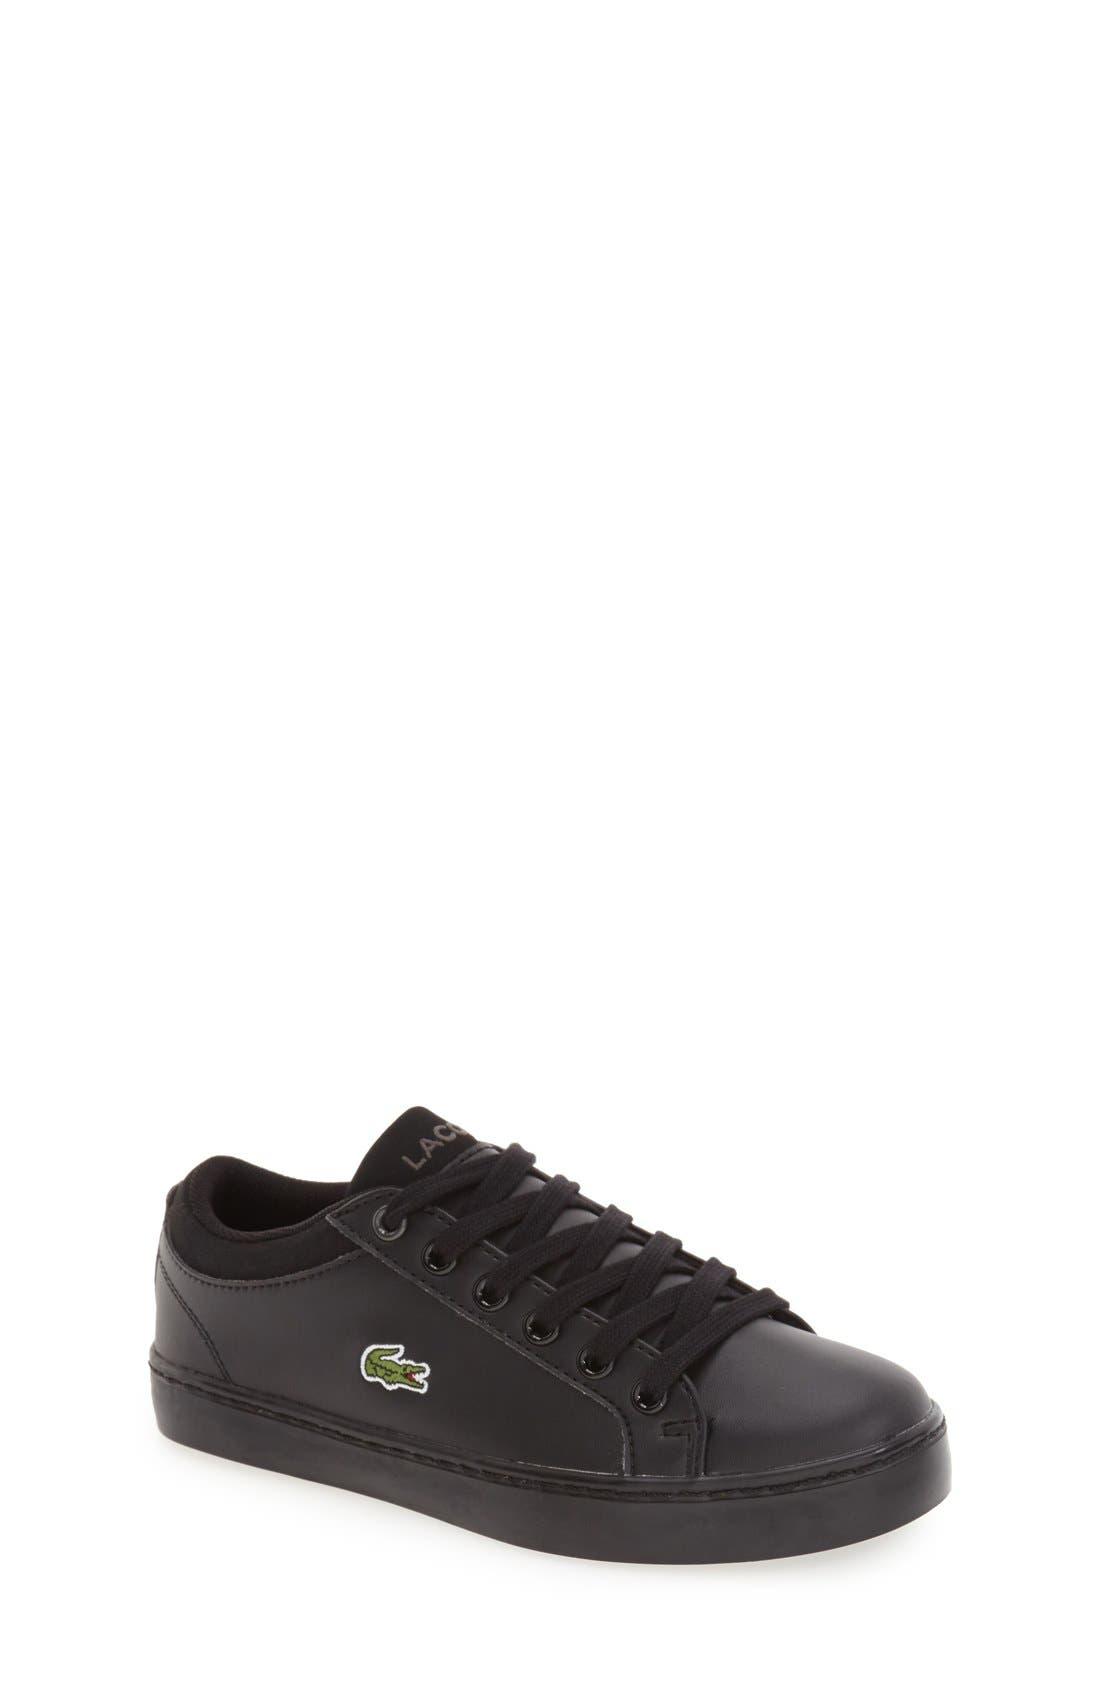 Lacoste 'Straightset' Sneaker (Toddler, Little Kid & Big Kid)